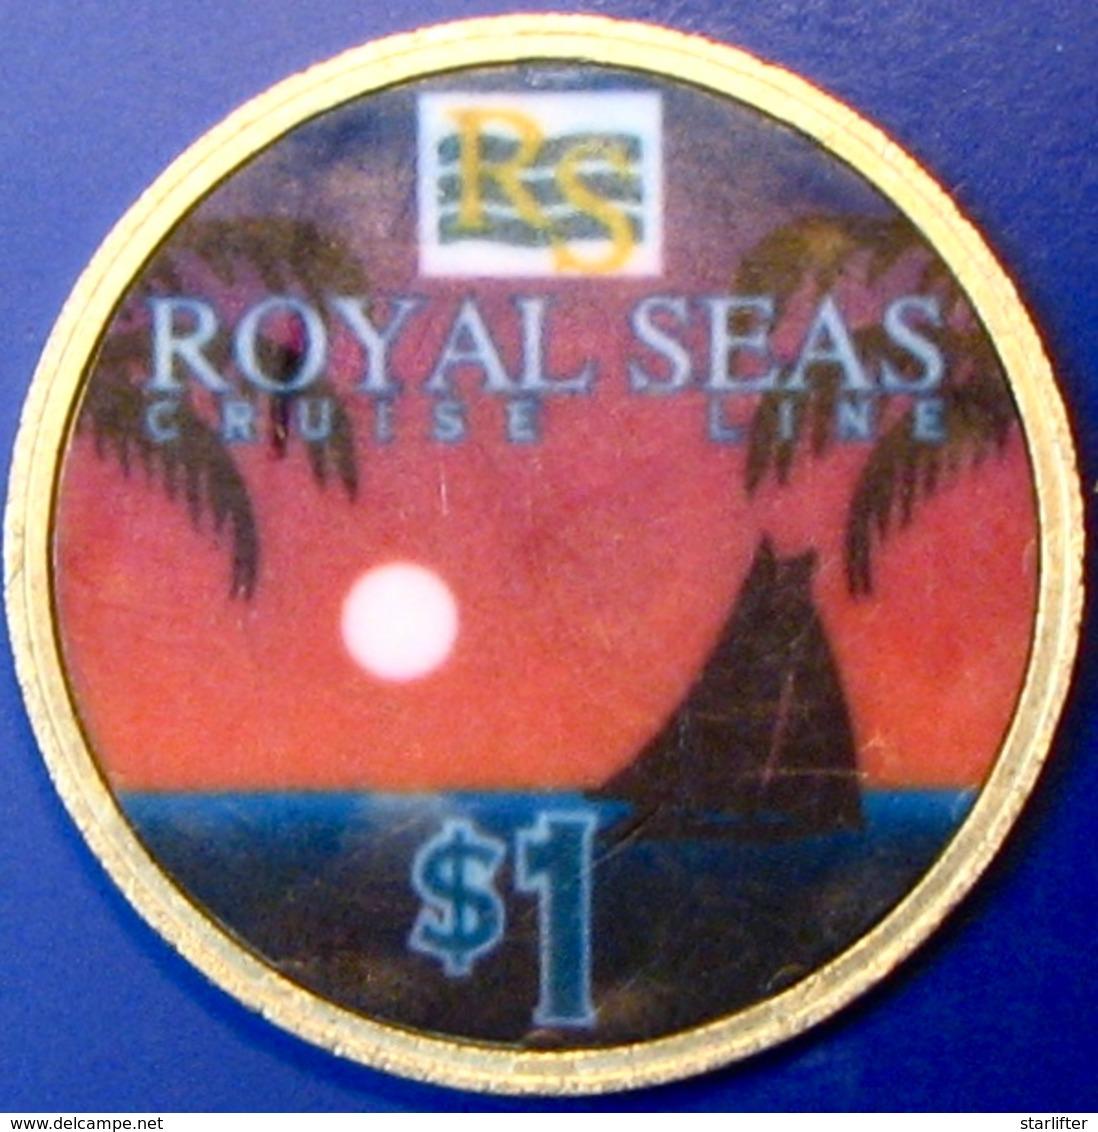 $1 Casino Chip. Royal Seas Cruise Line. M85. - Casino